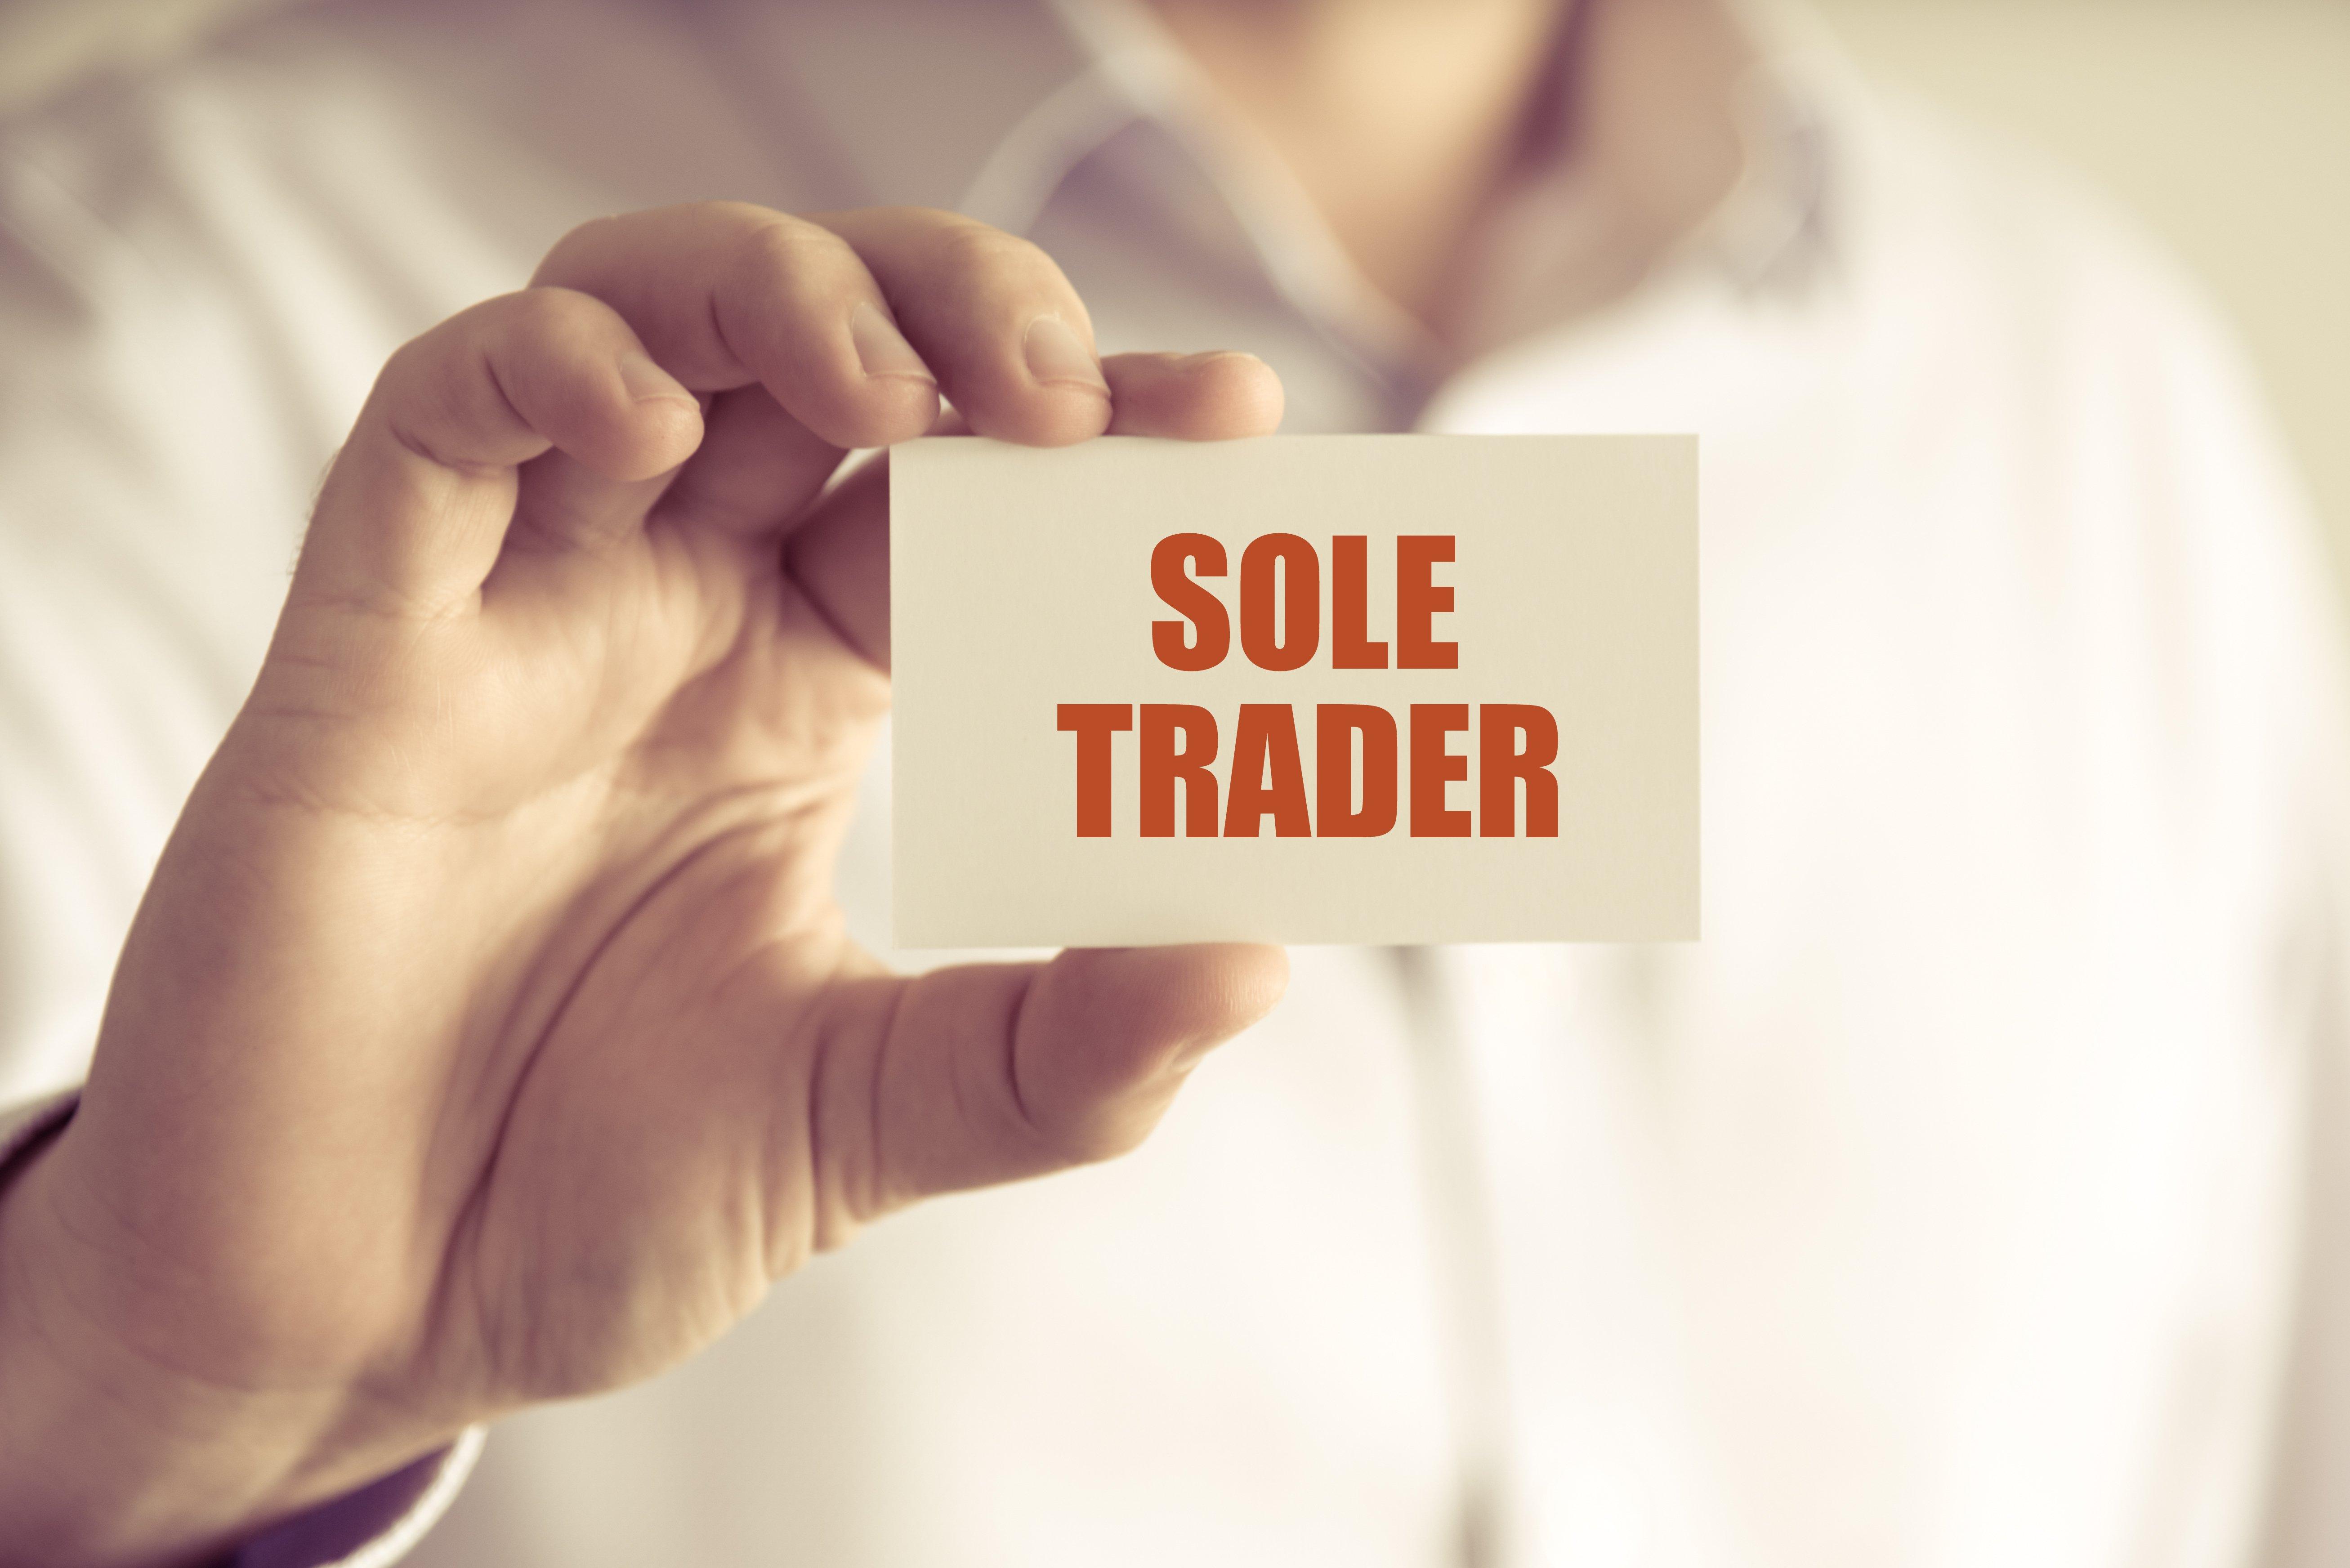 How do I register as a sole trader - Sole Trader Information | Informi